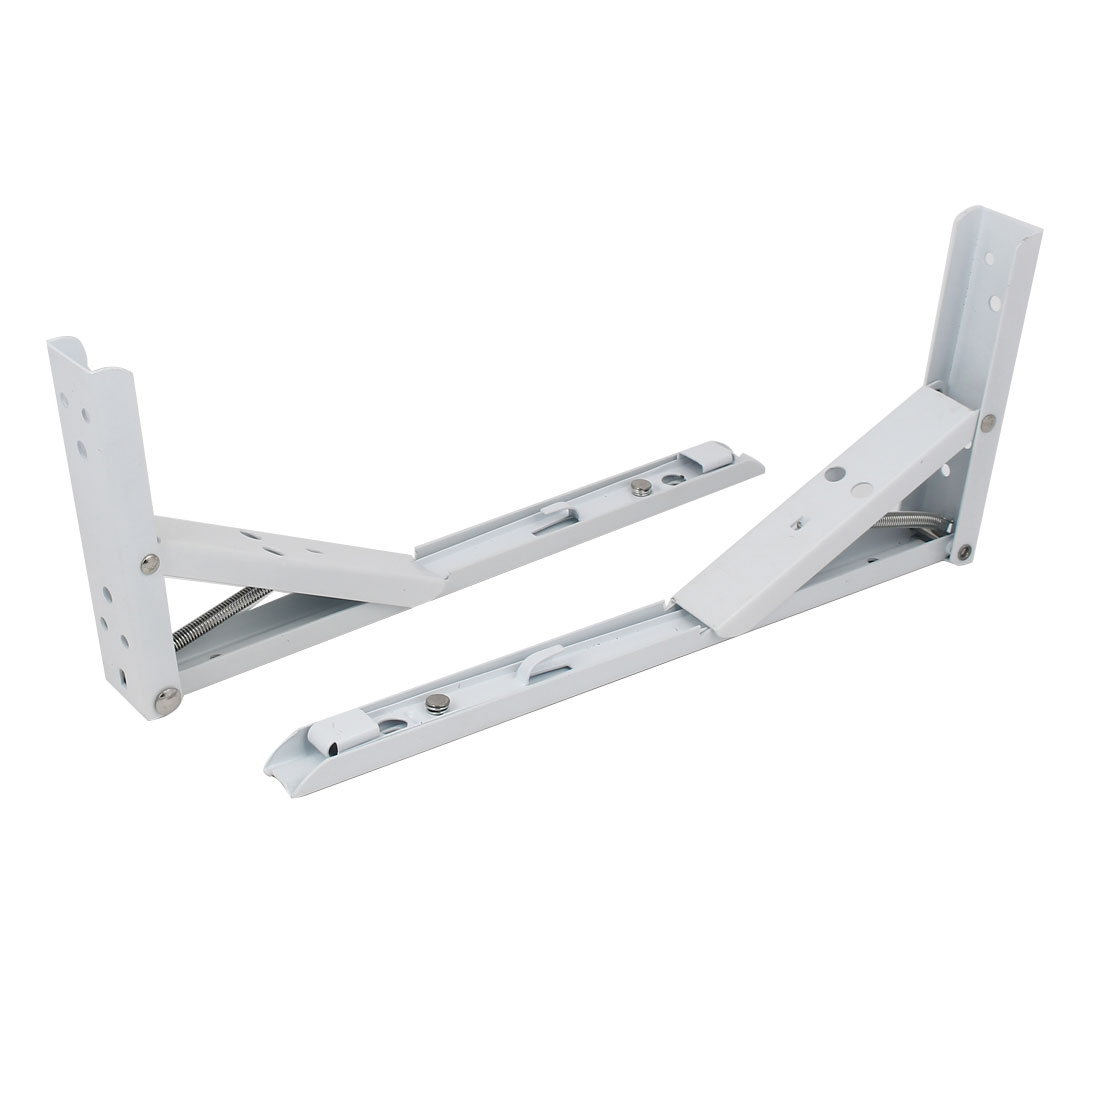 12-inch Long Metal Spring Loaded Folding Shelf Bracket Support White 2pcs